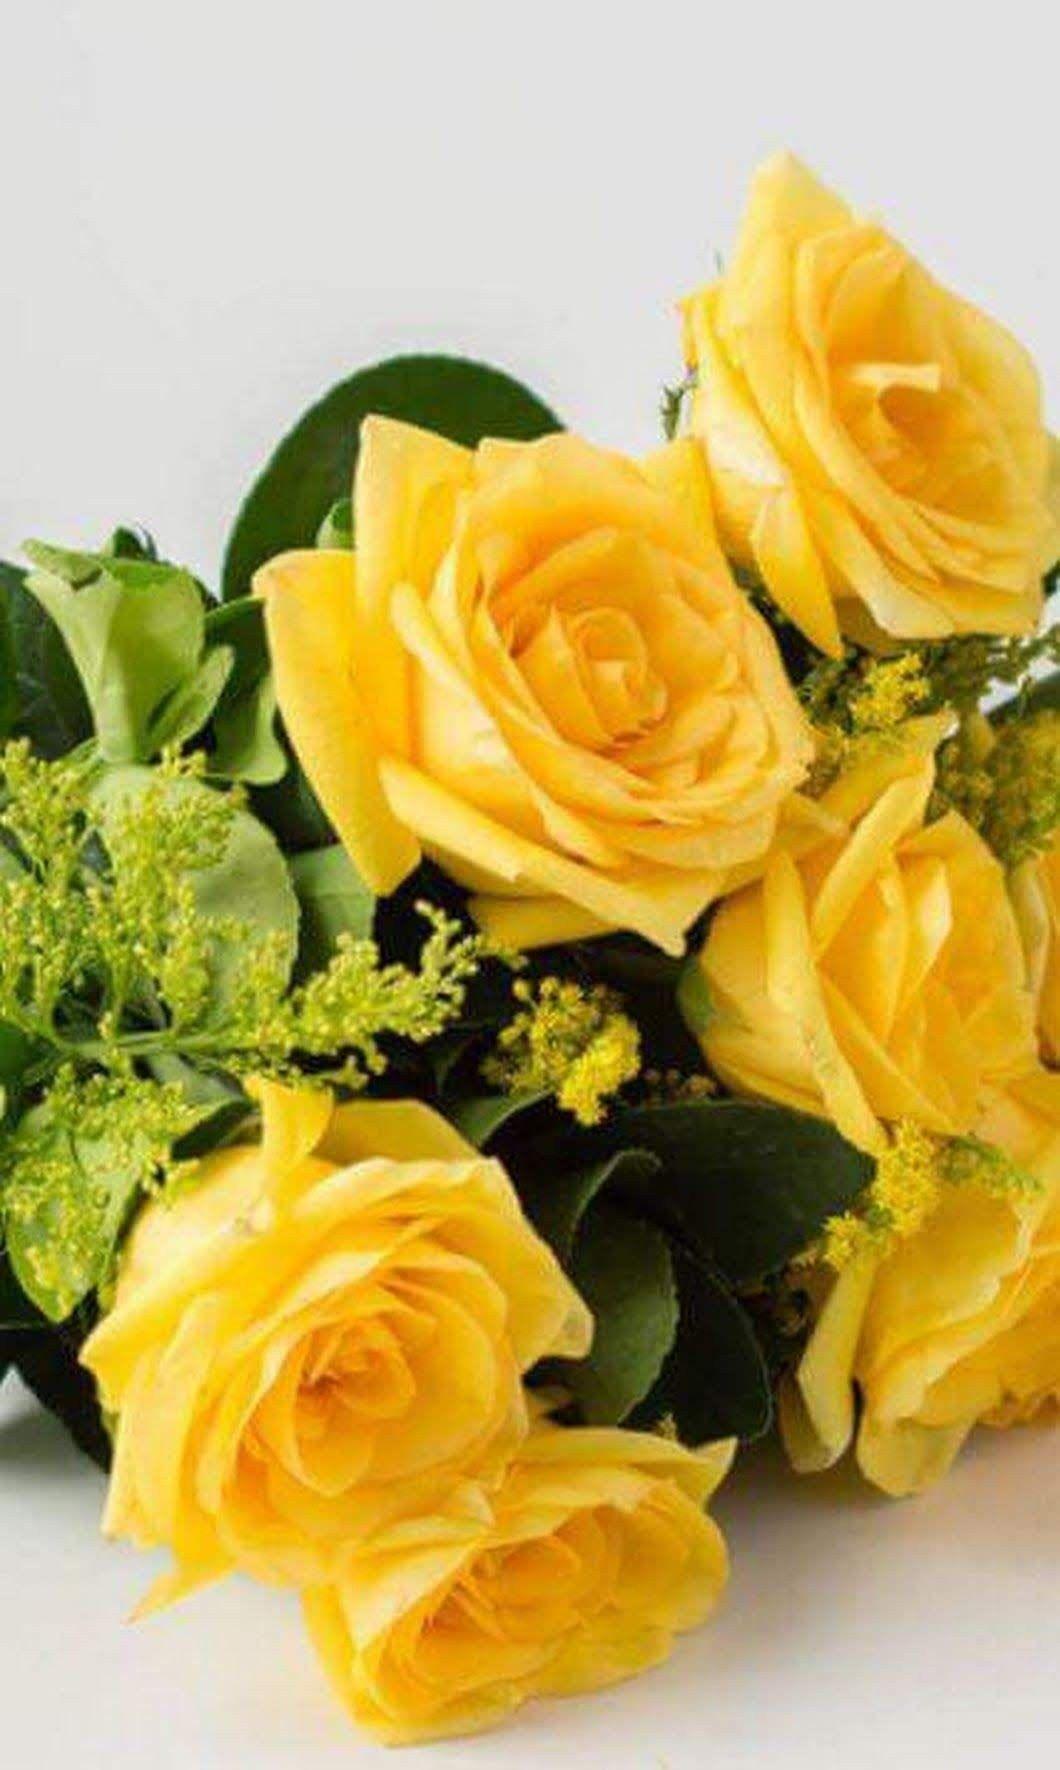 اللون الاصفر المفضل لدي ورد Yellow Roses Beautiful Flowers Beautiful Roses